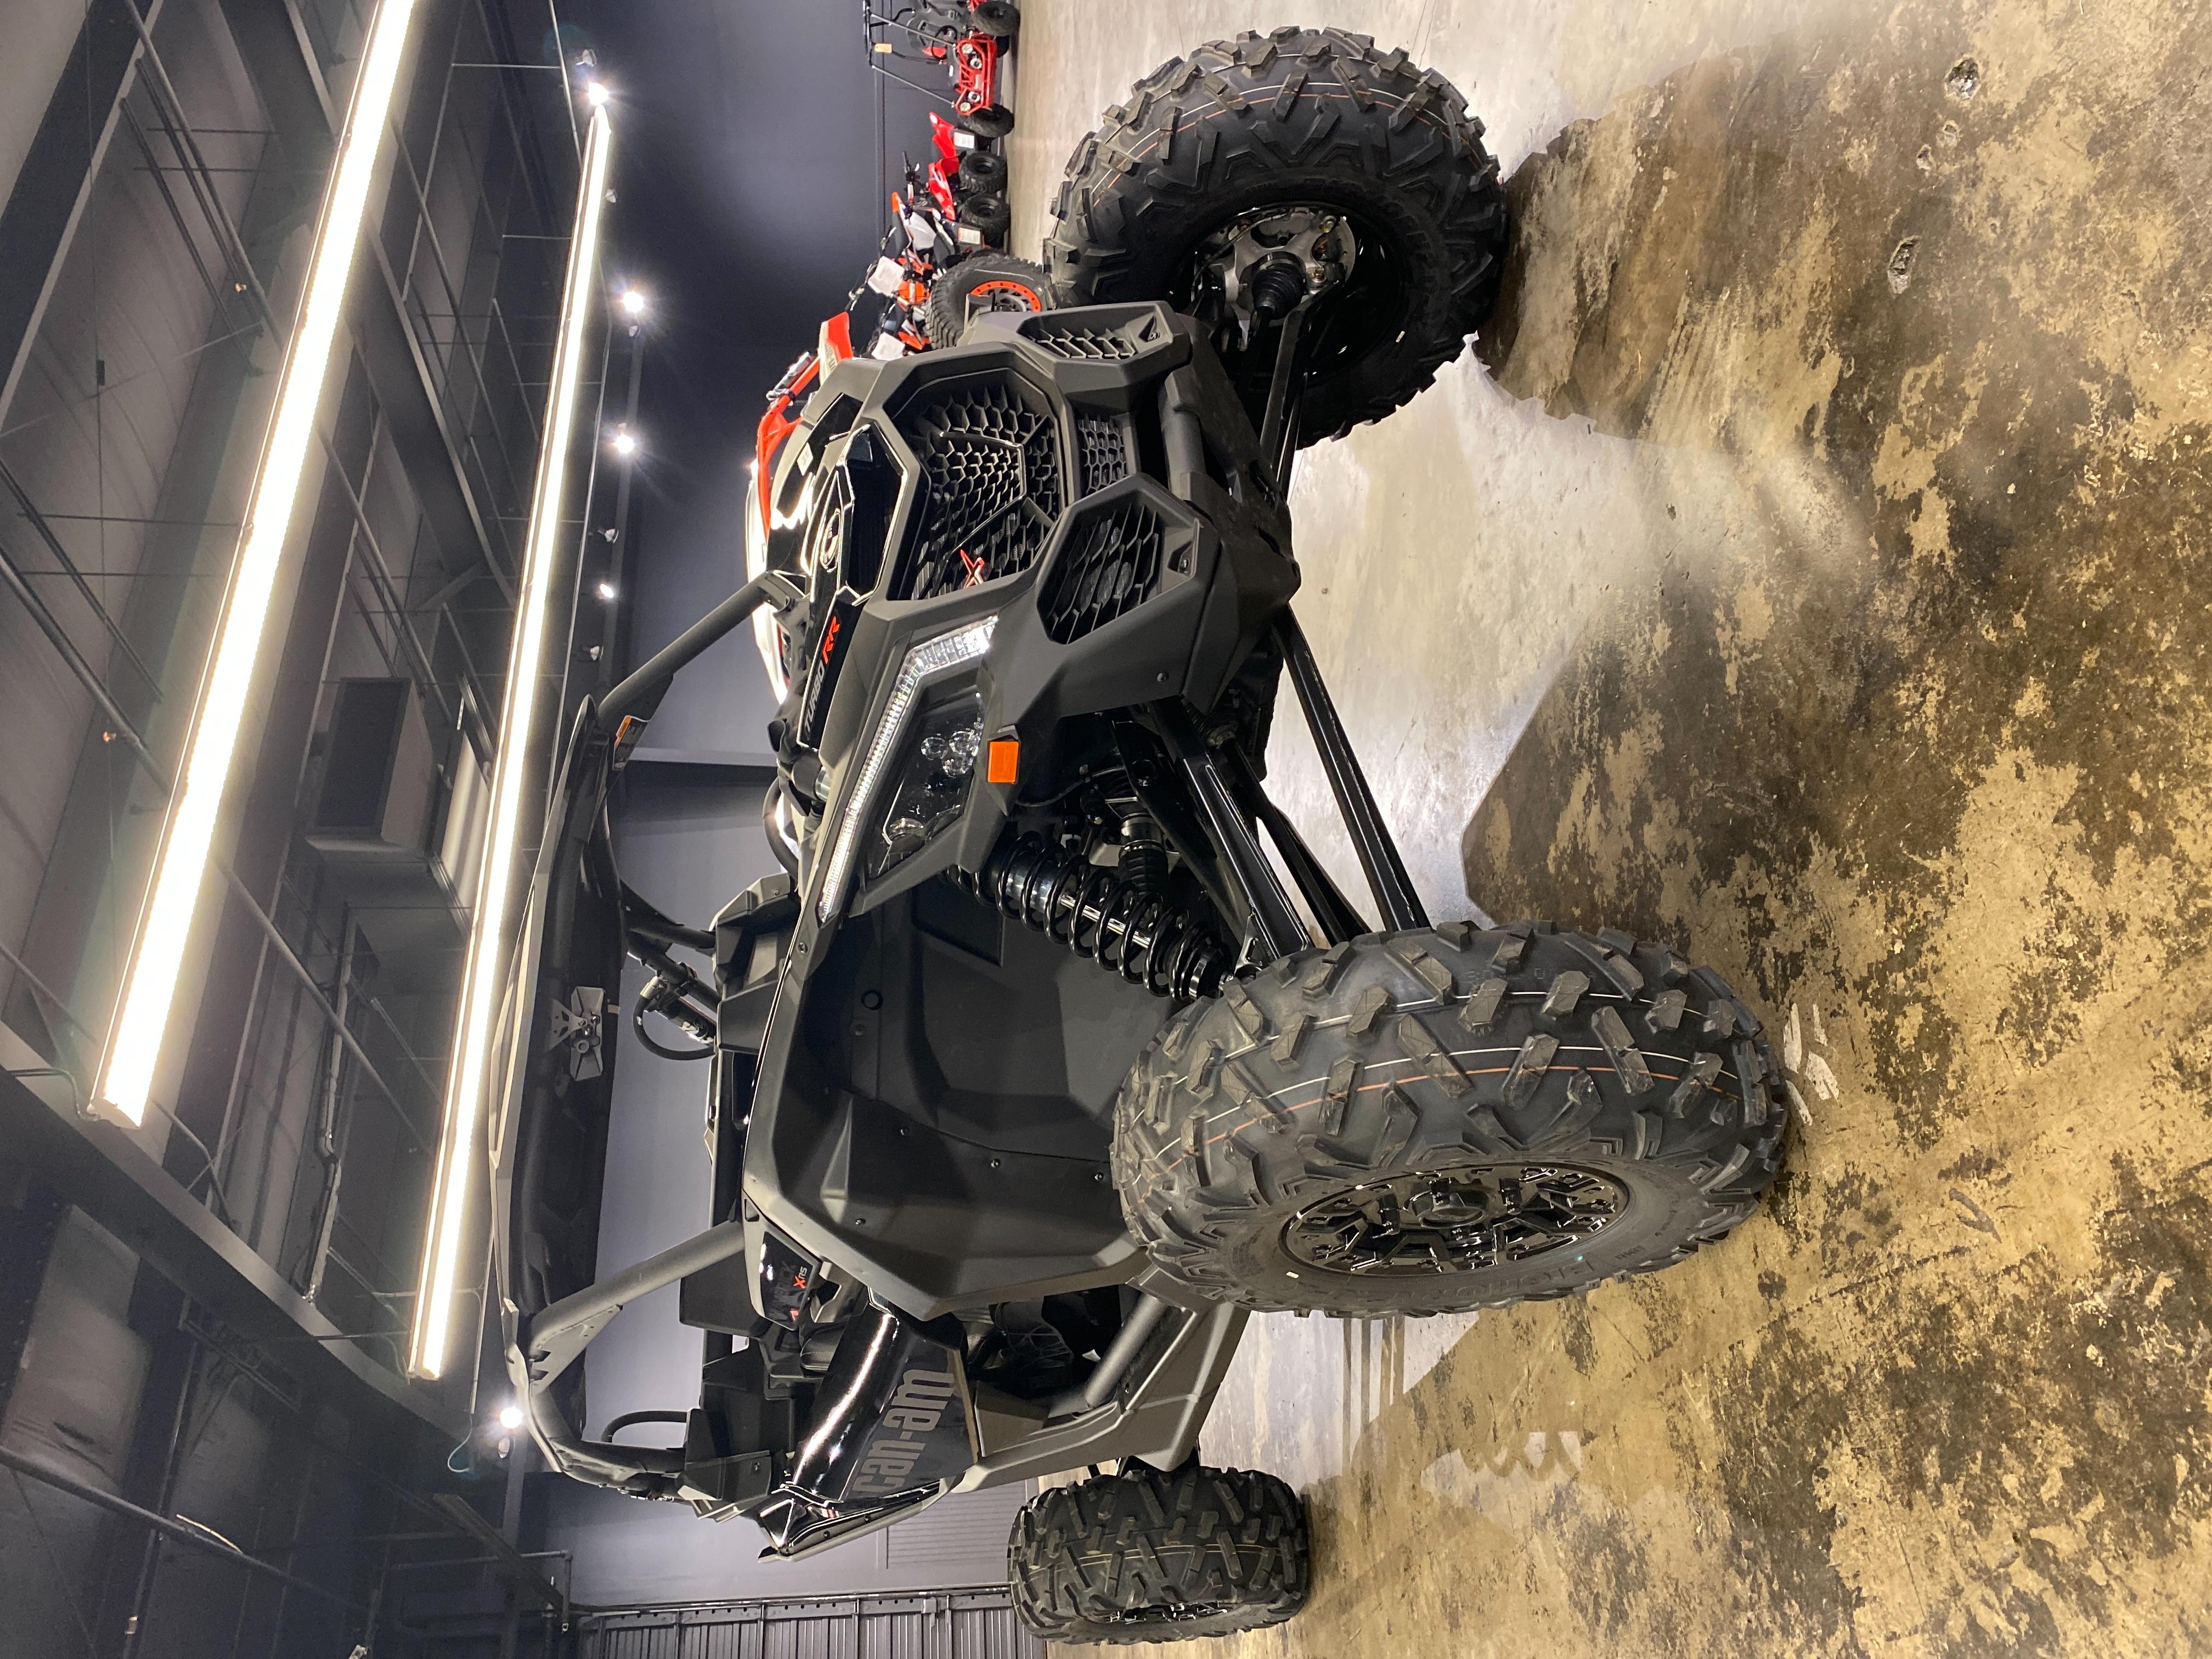 2021 Can-Am Maverick X3 X rs TURBO RR at Sloans Motorcycle ATV, Murfreesboro, TN, 37129